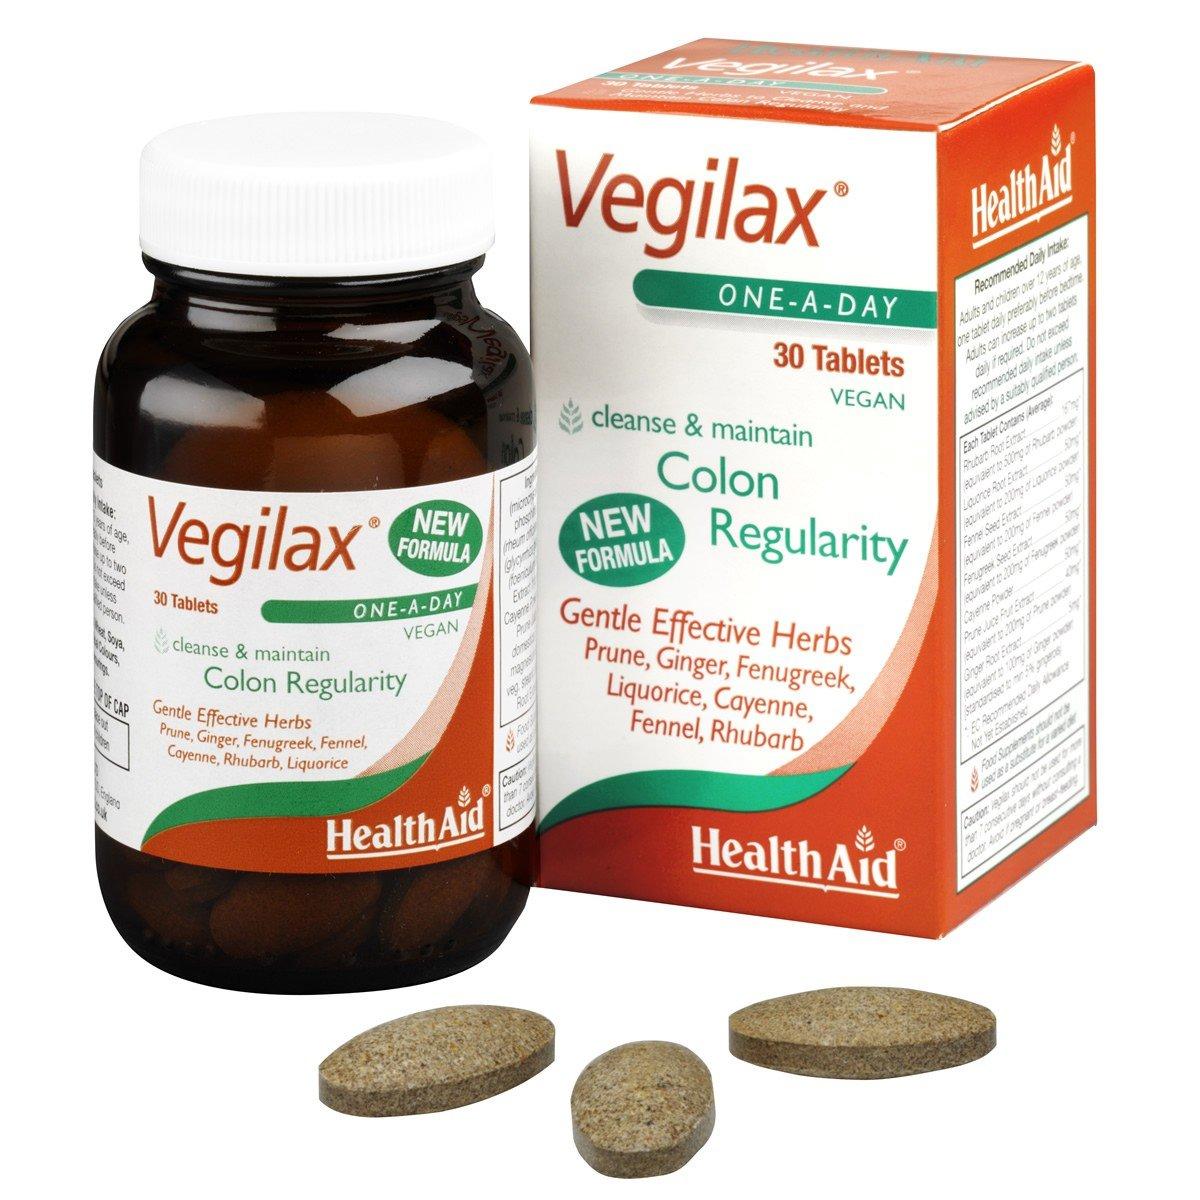 Health Aid Vegilax Καθαρό Έντερο 30 Tablets